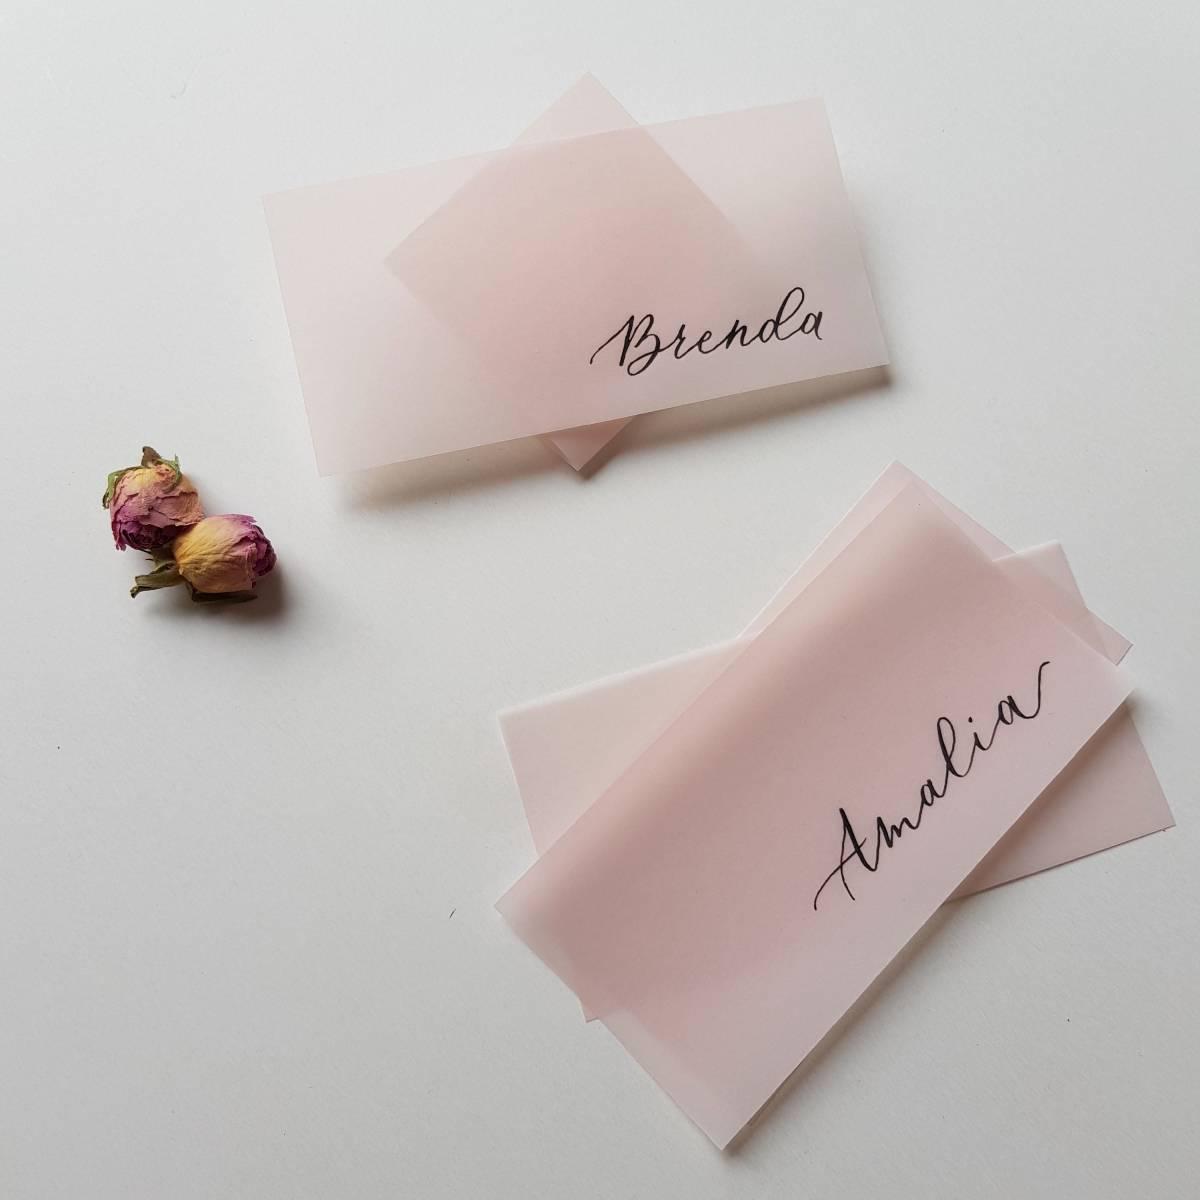 Touch of Gold - Workshops - Vrijgezellen - Trouwuitnodiging - Huwelijksuitnodiging - Kalligrafie - House of Weddings - 5